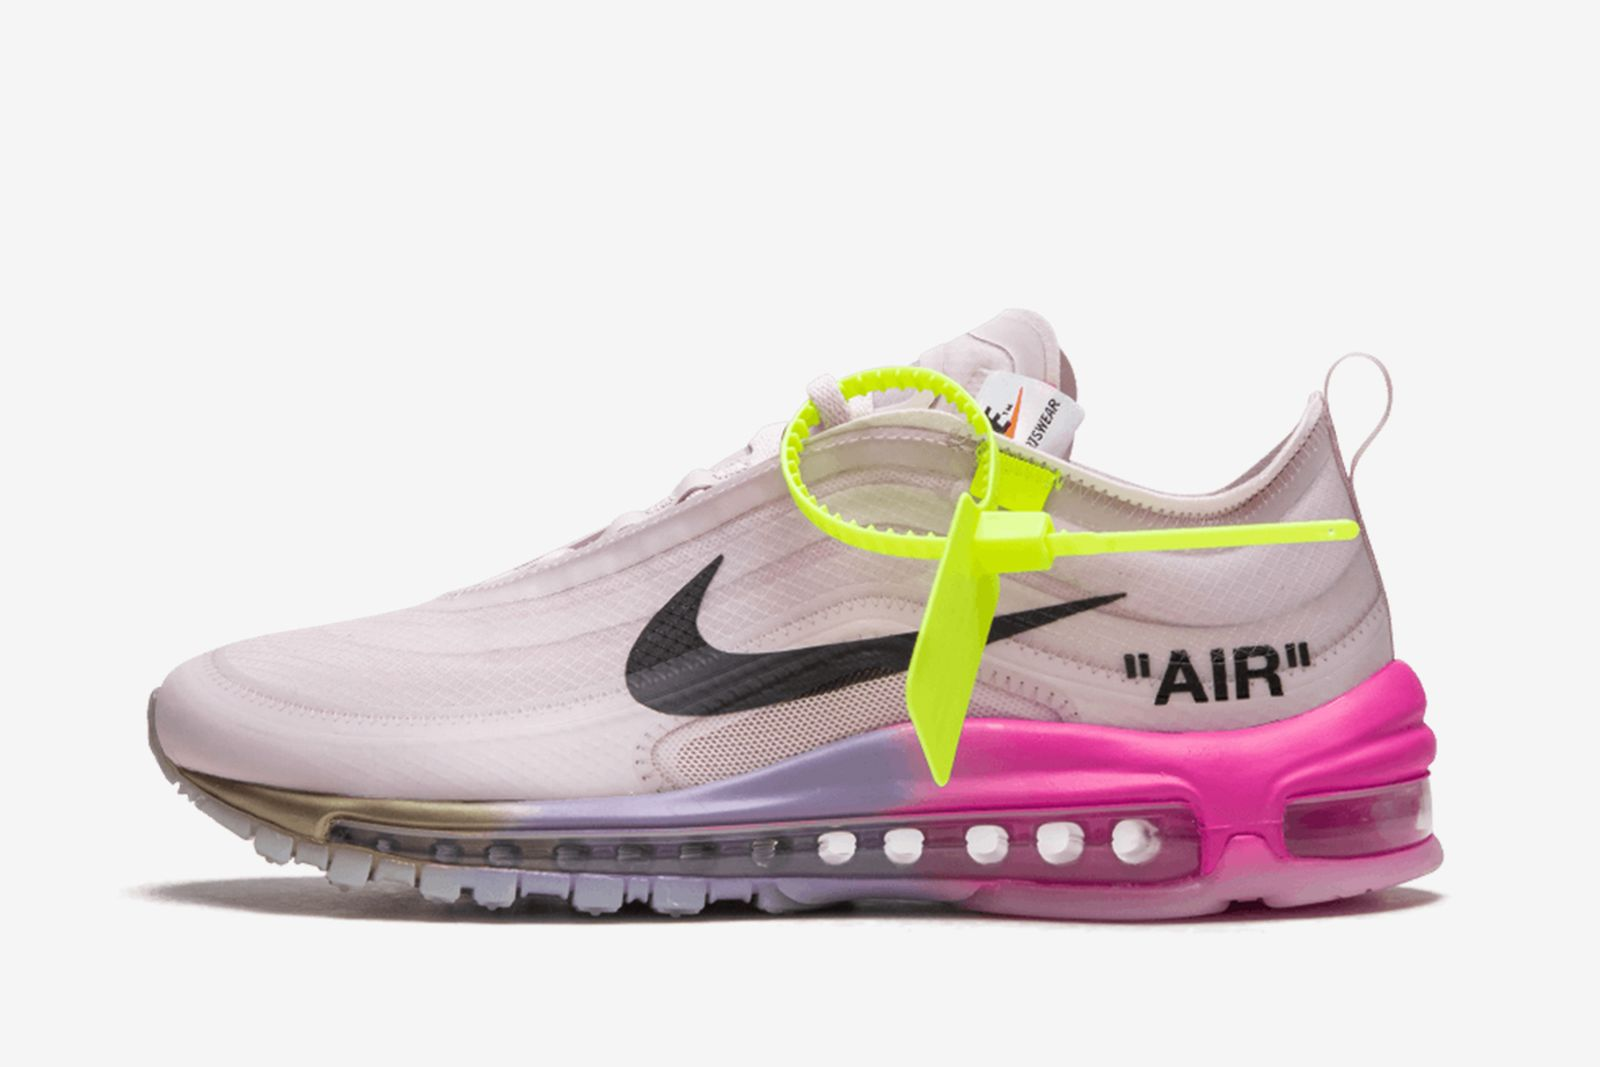 AJ4585 600 1 GOAT Nike The Ten OFF-WHITE c/o Virgil Abloh